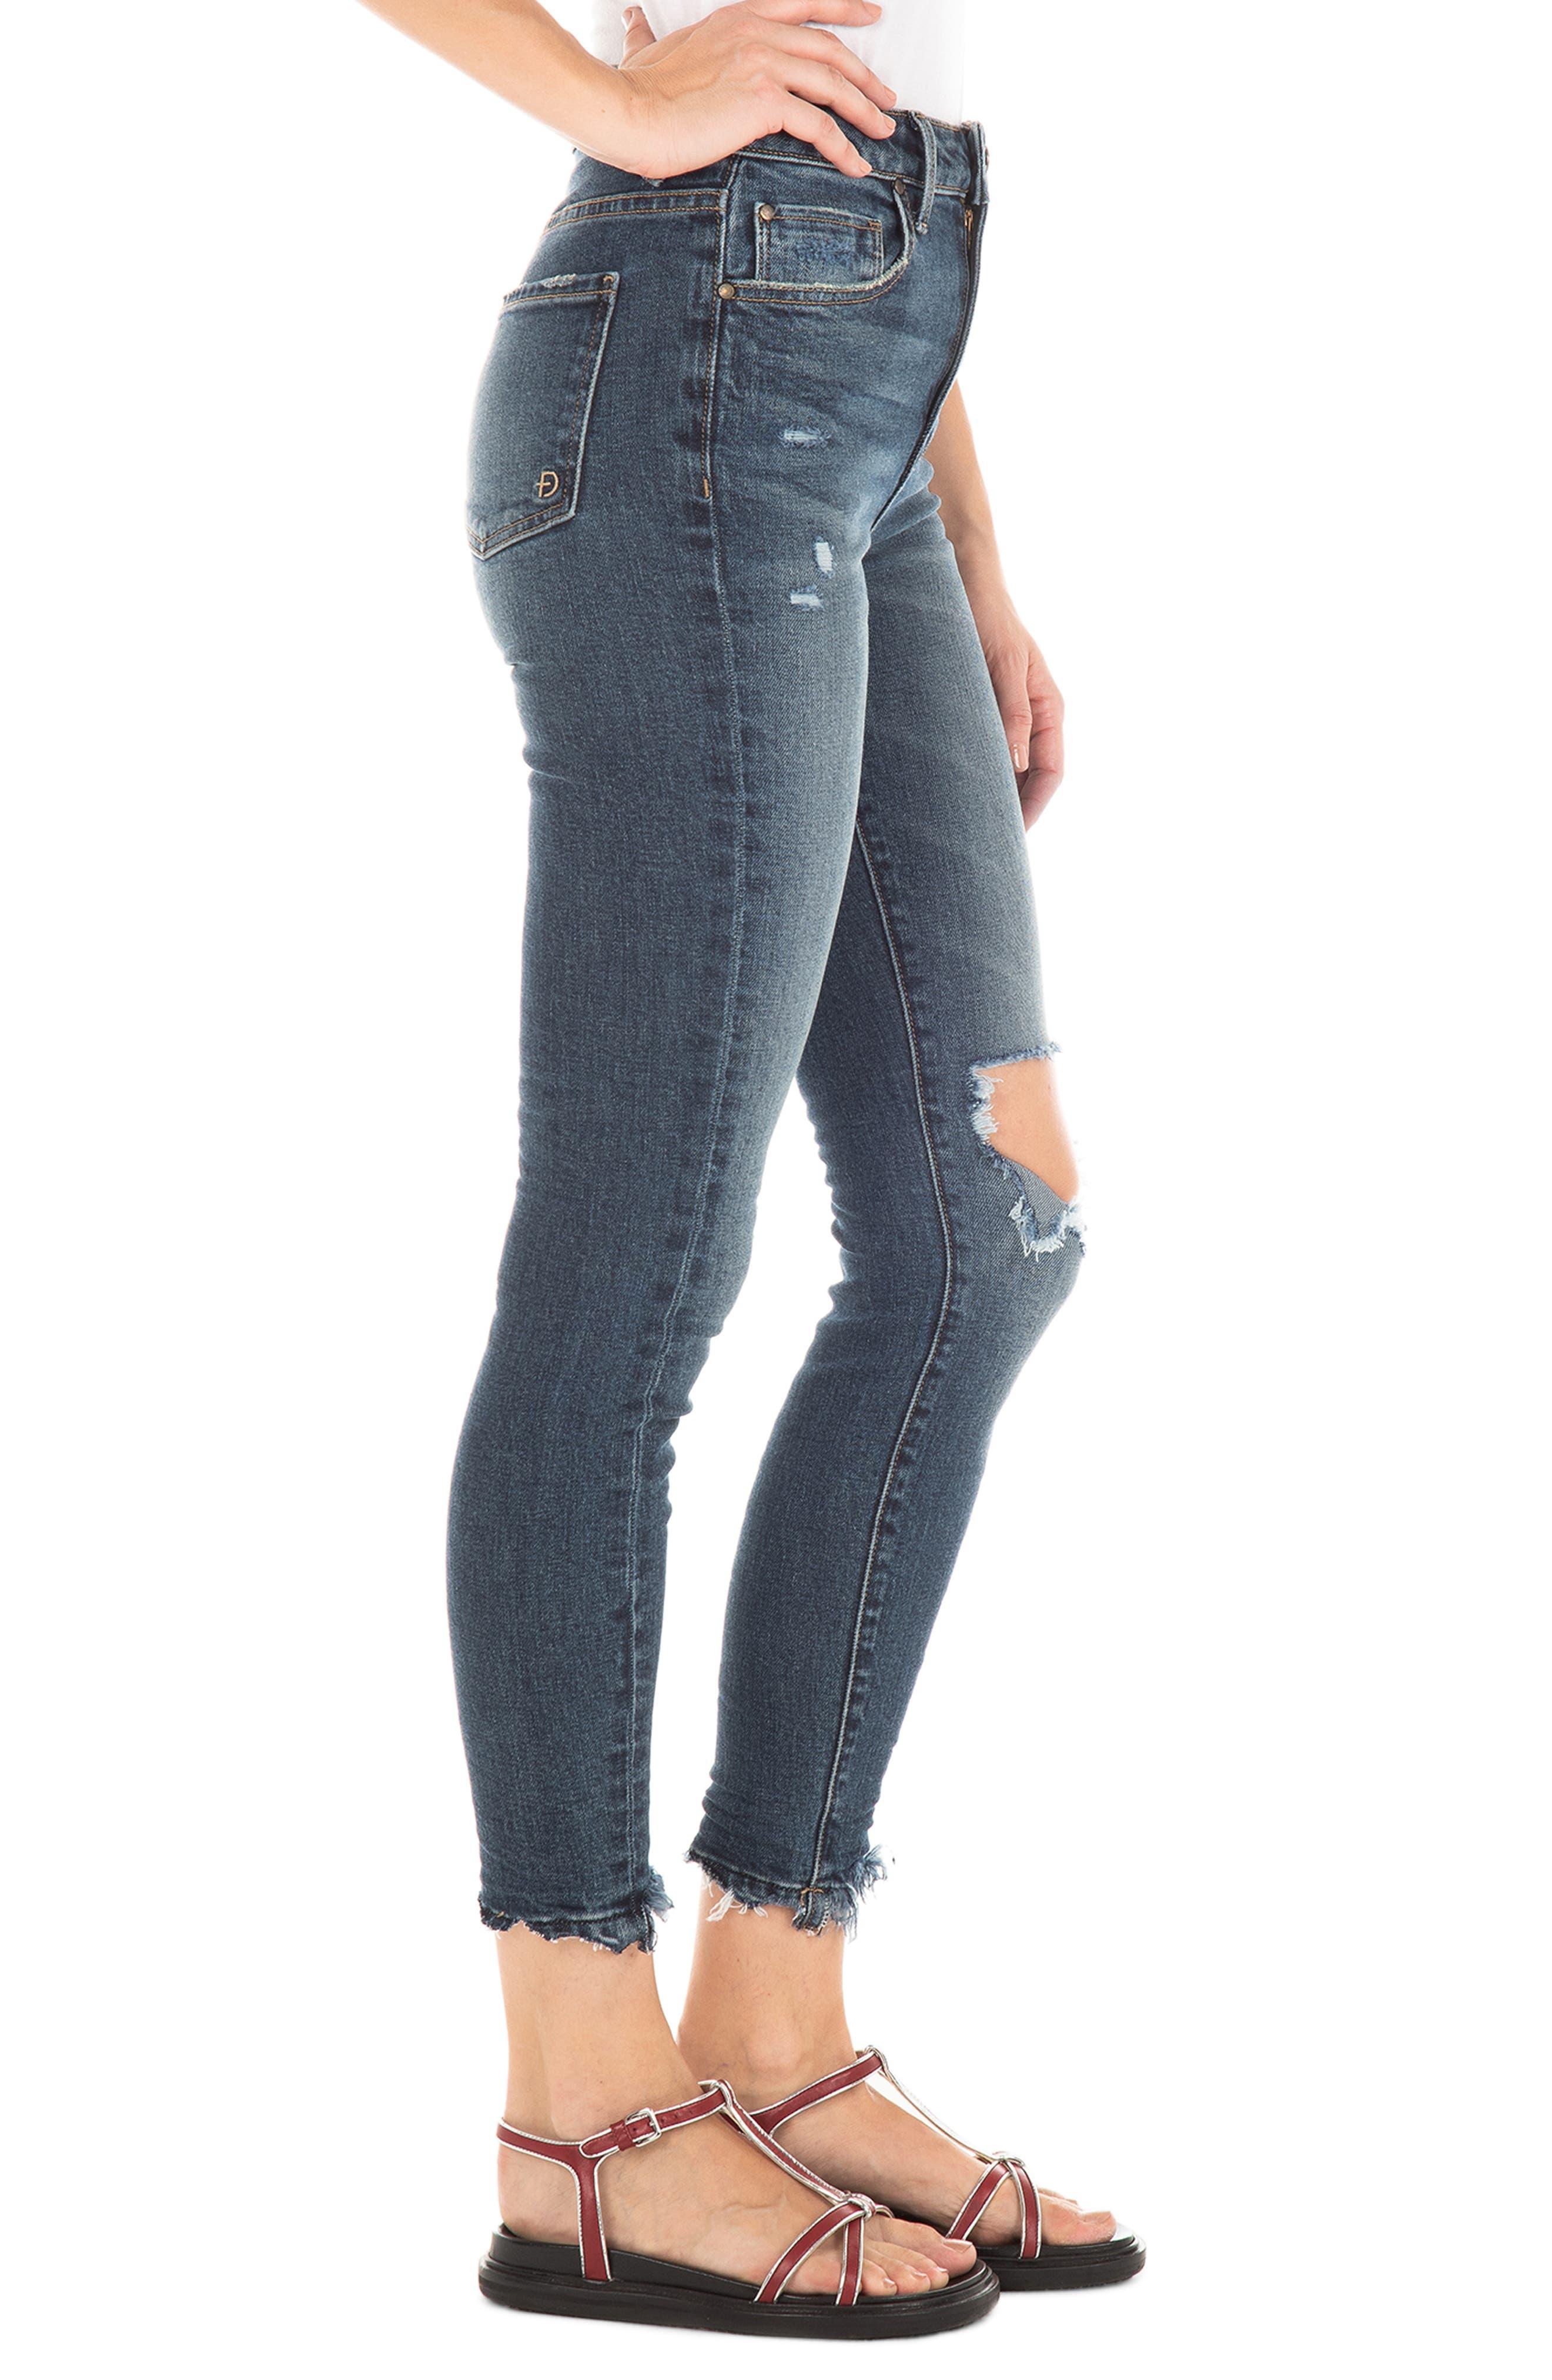 FIDELITY DENIM,                             Luna Ripped High Waist Crop Skinny Jeans,                             Alternate thumbnail 3, color,                             ROCKAWAY BLUE